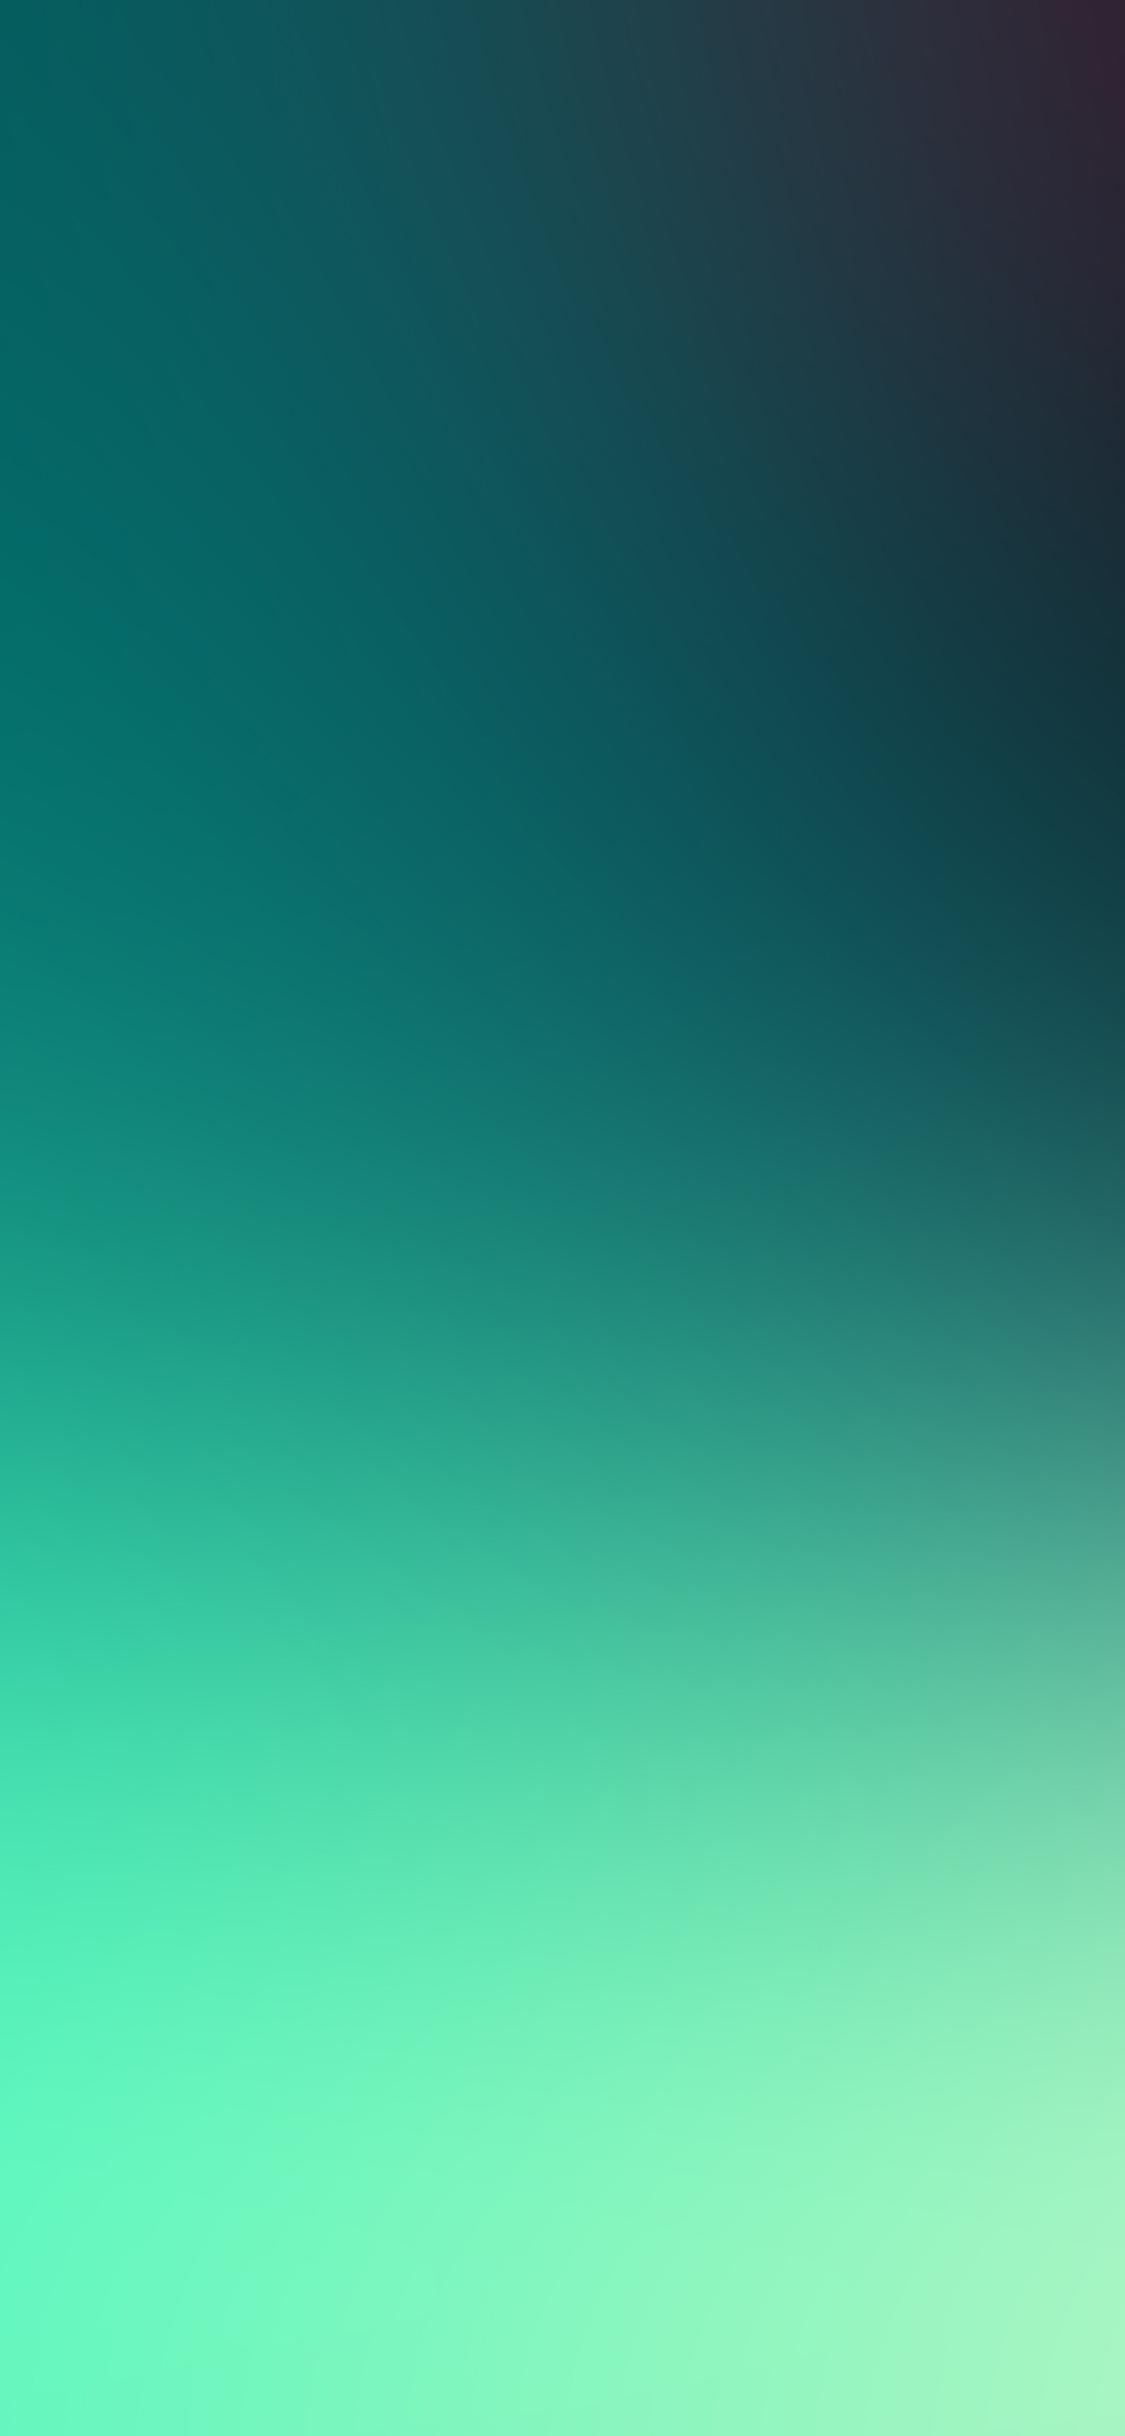 iPhoneXpapers.com-Apple-iPhone-wallpaper-sl72-green-purple-blur-gradation